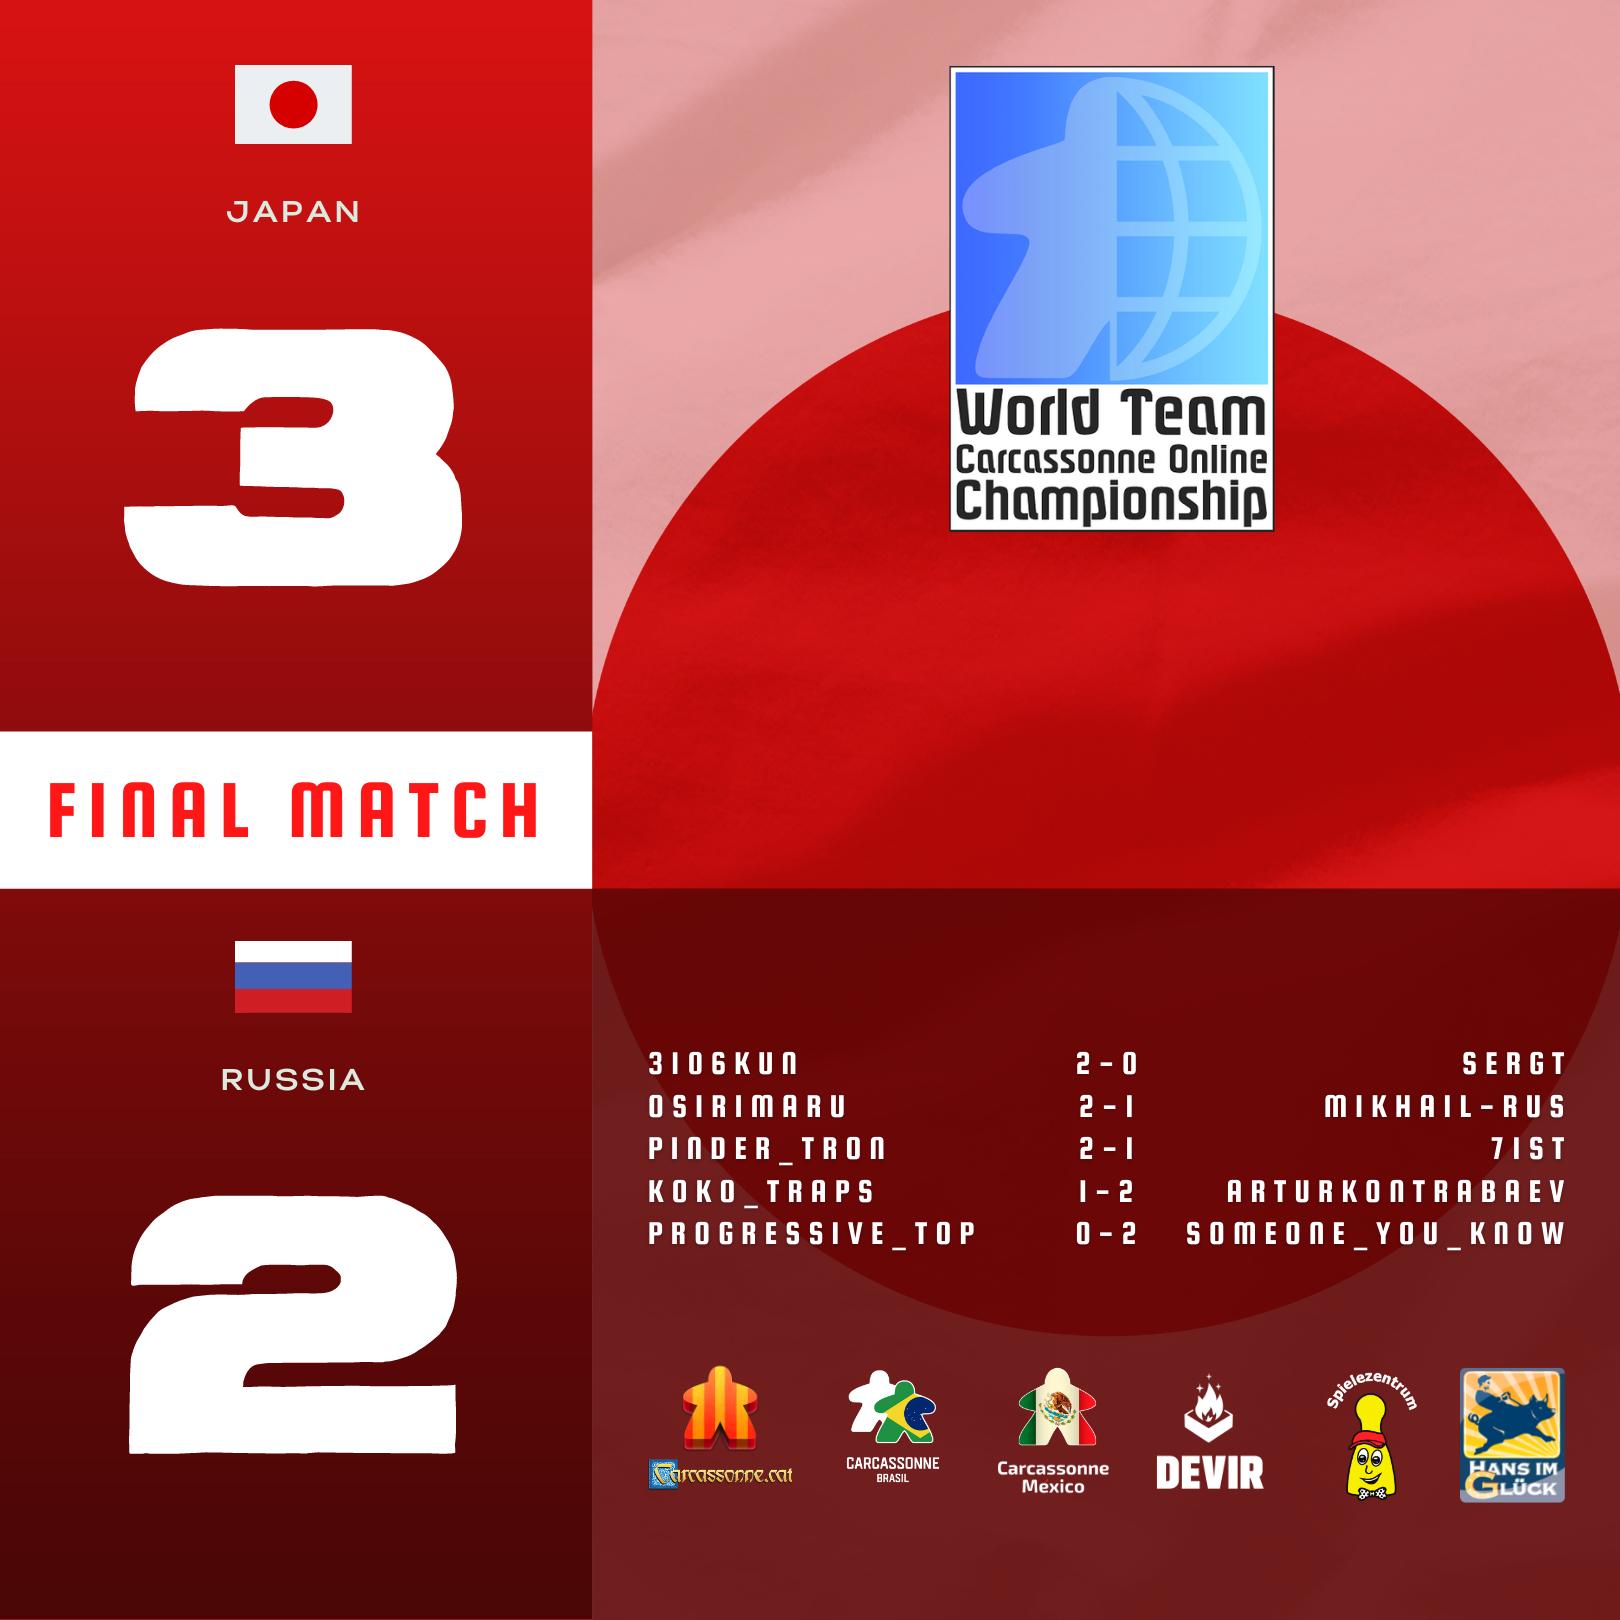 JAPAN WINNER